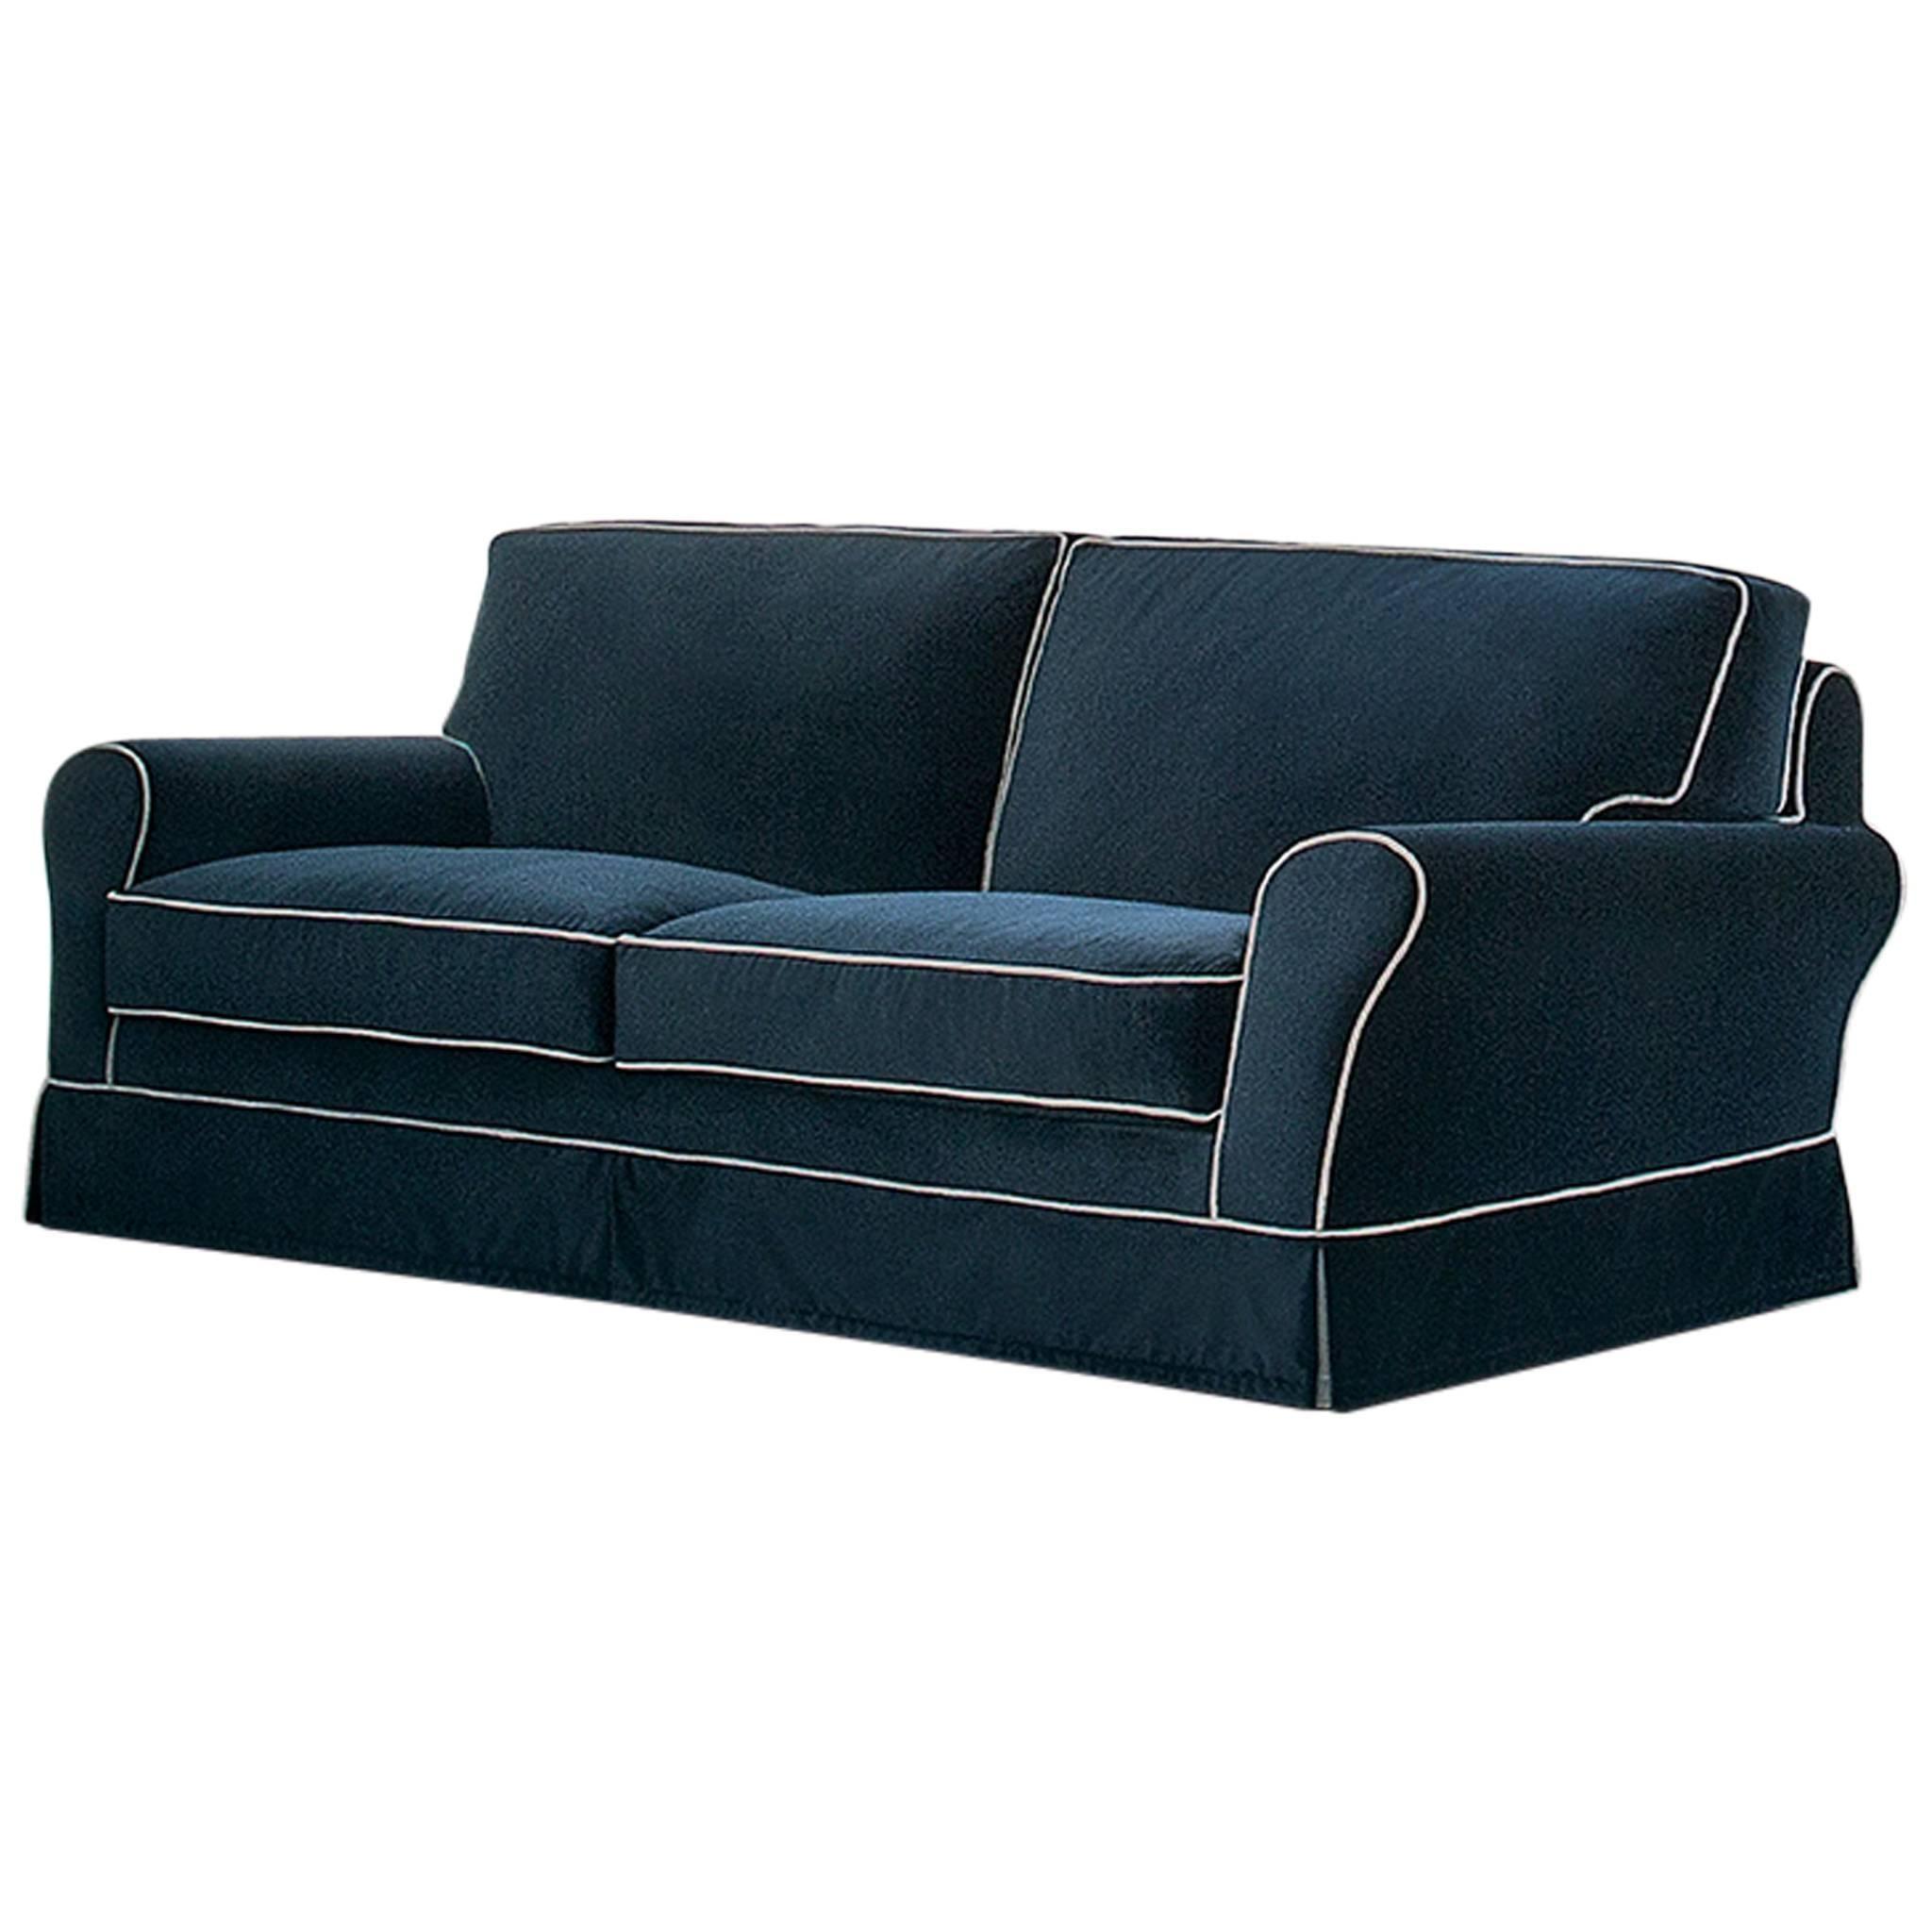 Italian Contemporary Sofa Muran, Made In Italy, Fabric, New